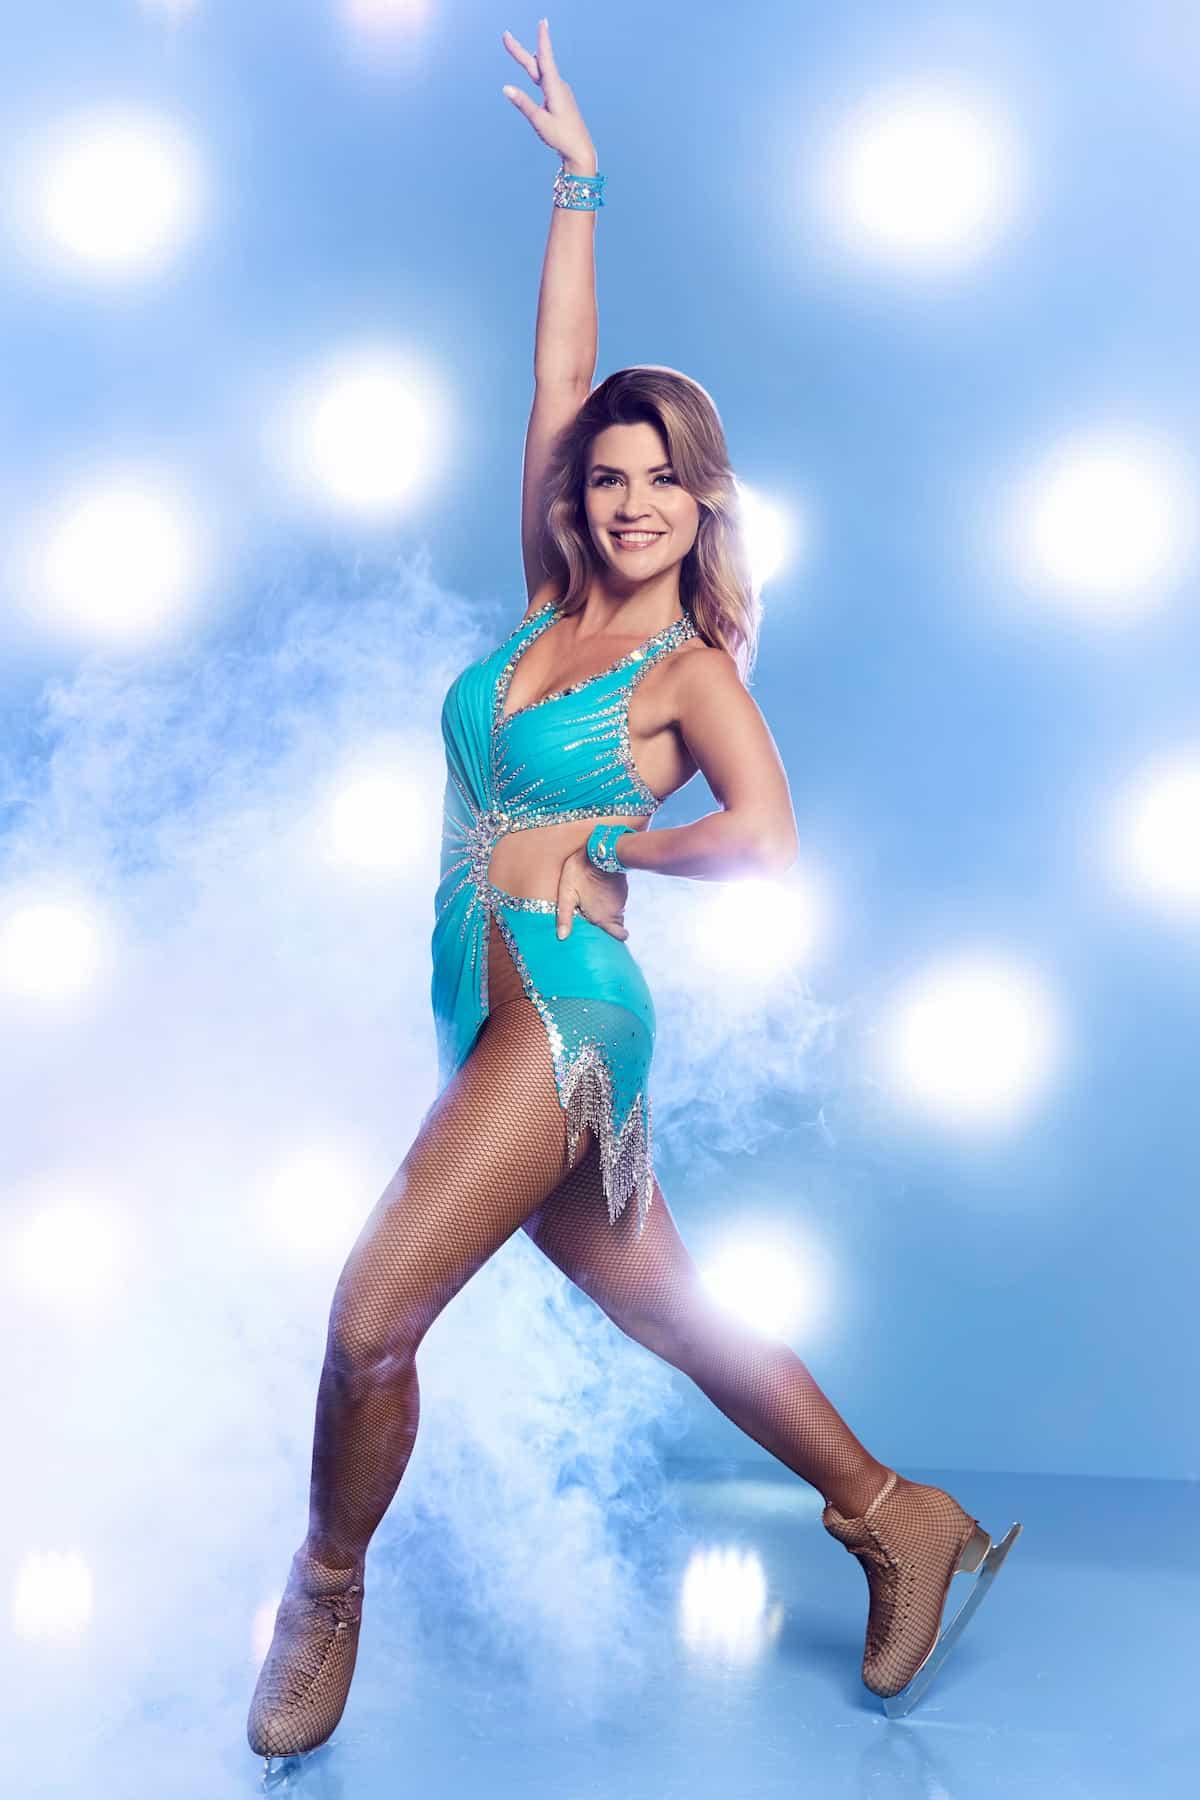 Nadine Klein Promi-Kandidatin Dancing on Ice 2019 Herbst-Winter 2te Staffel